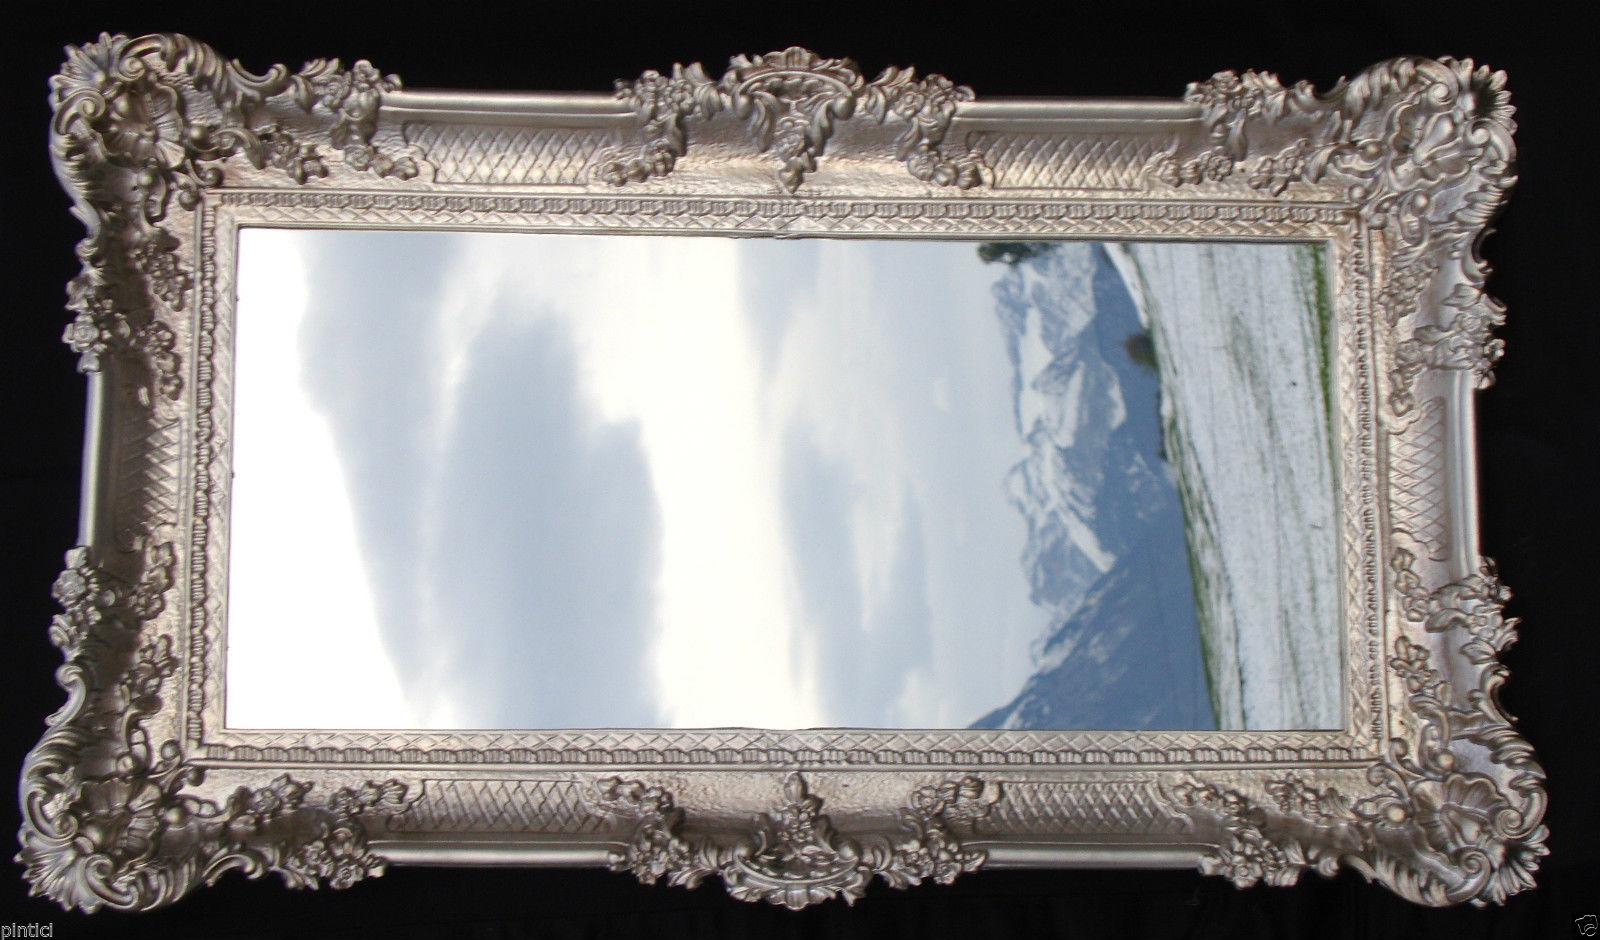 wandspiegel barock antik silber bad spiegel wanddeko 97x58